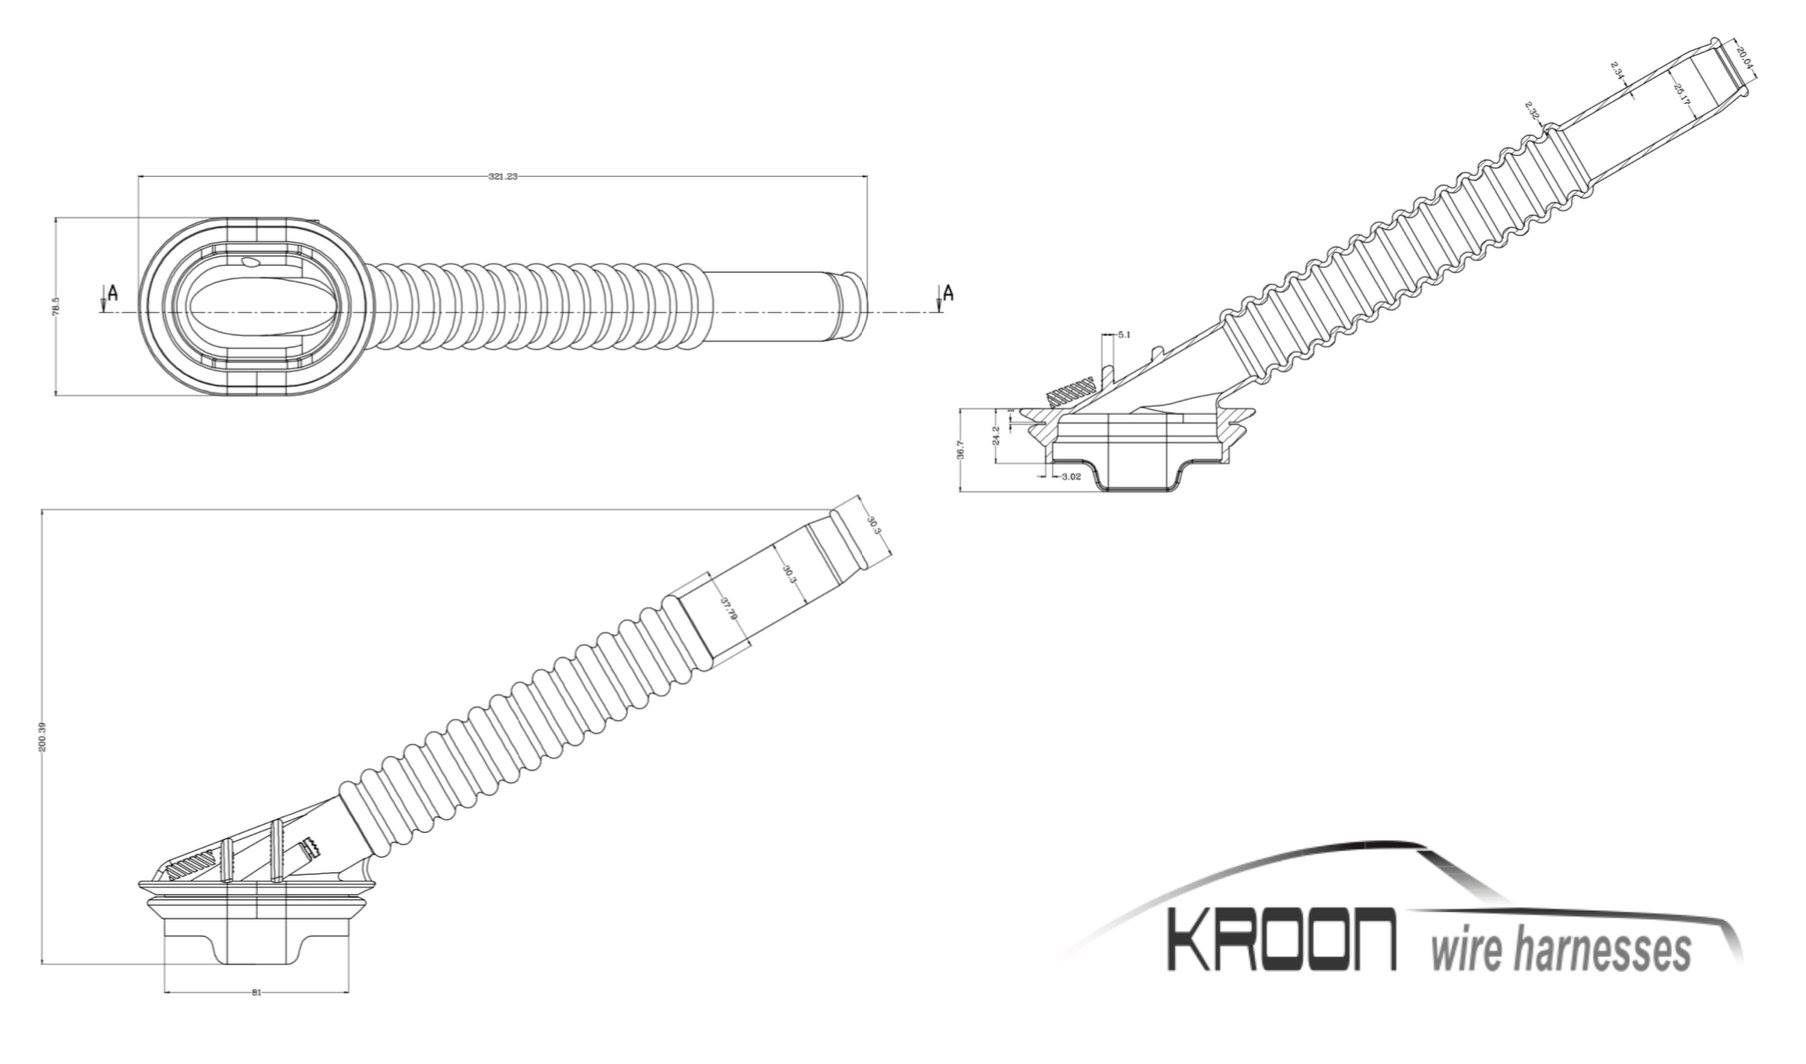 Porsche 944 Firewall Grommet For Engine Wiring Loom Harness